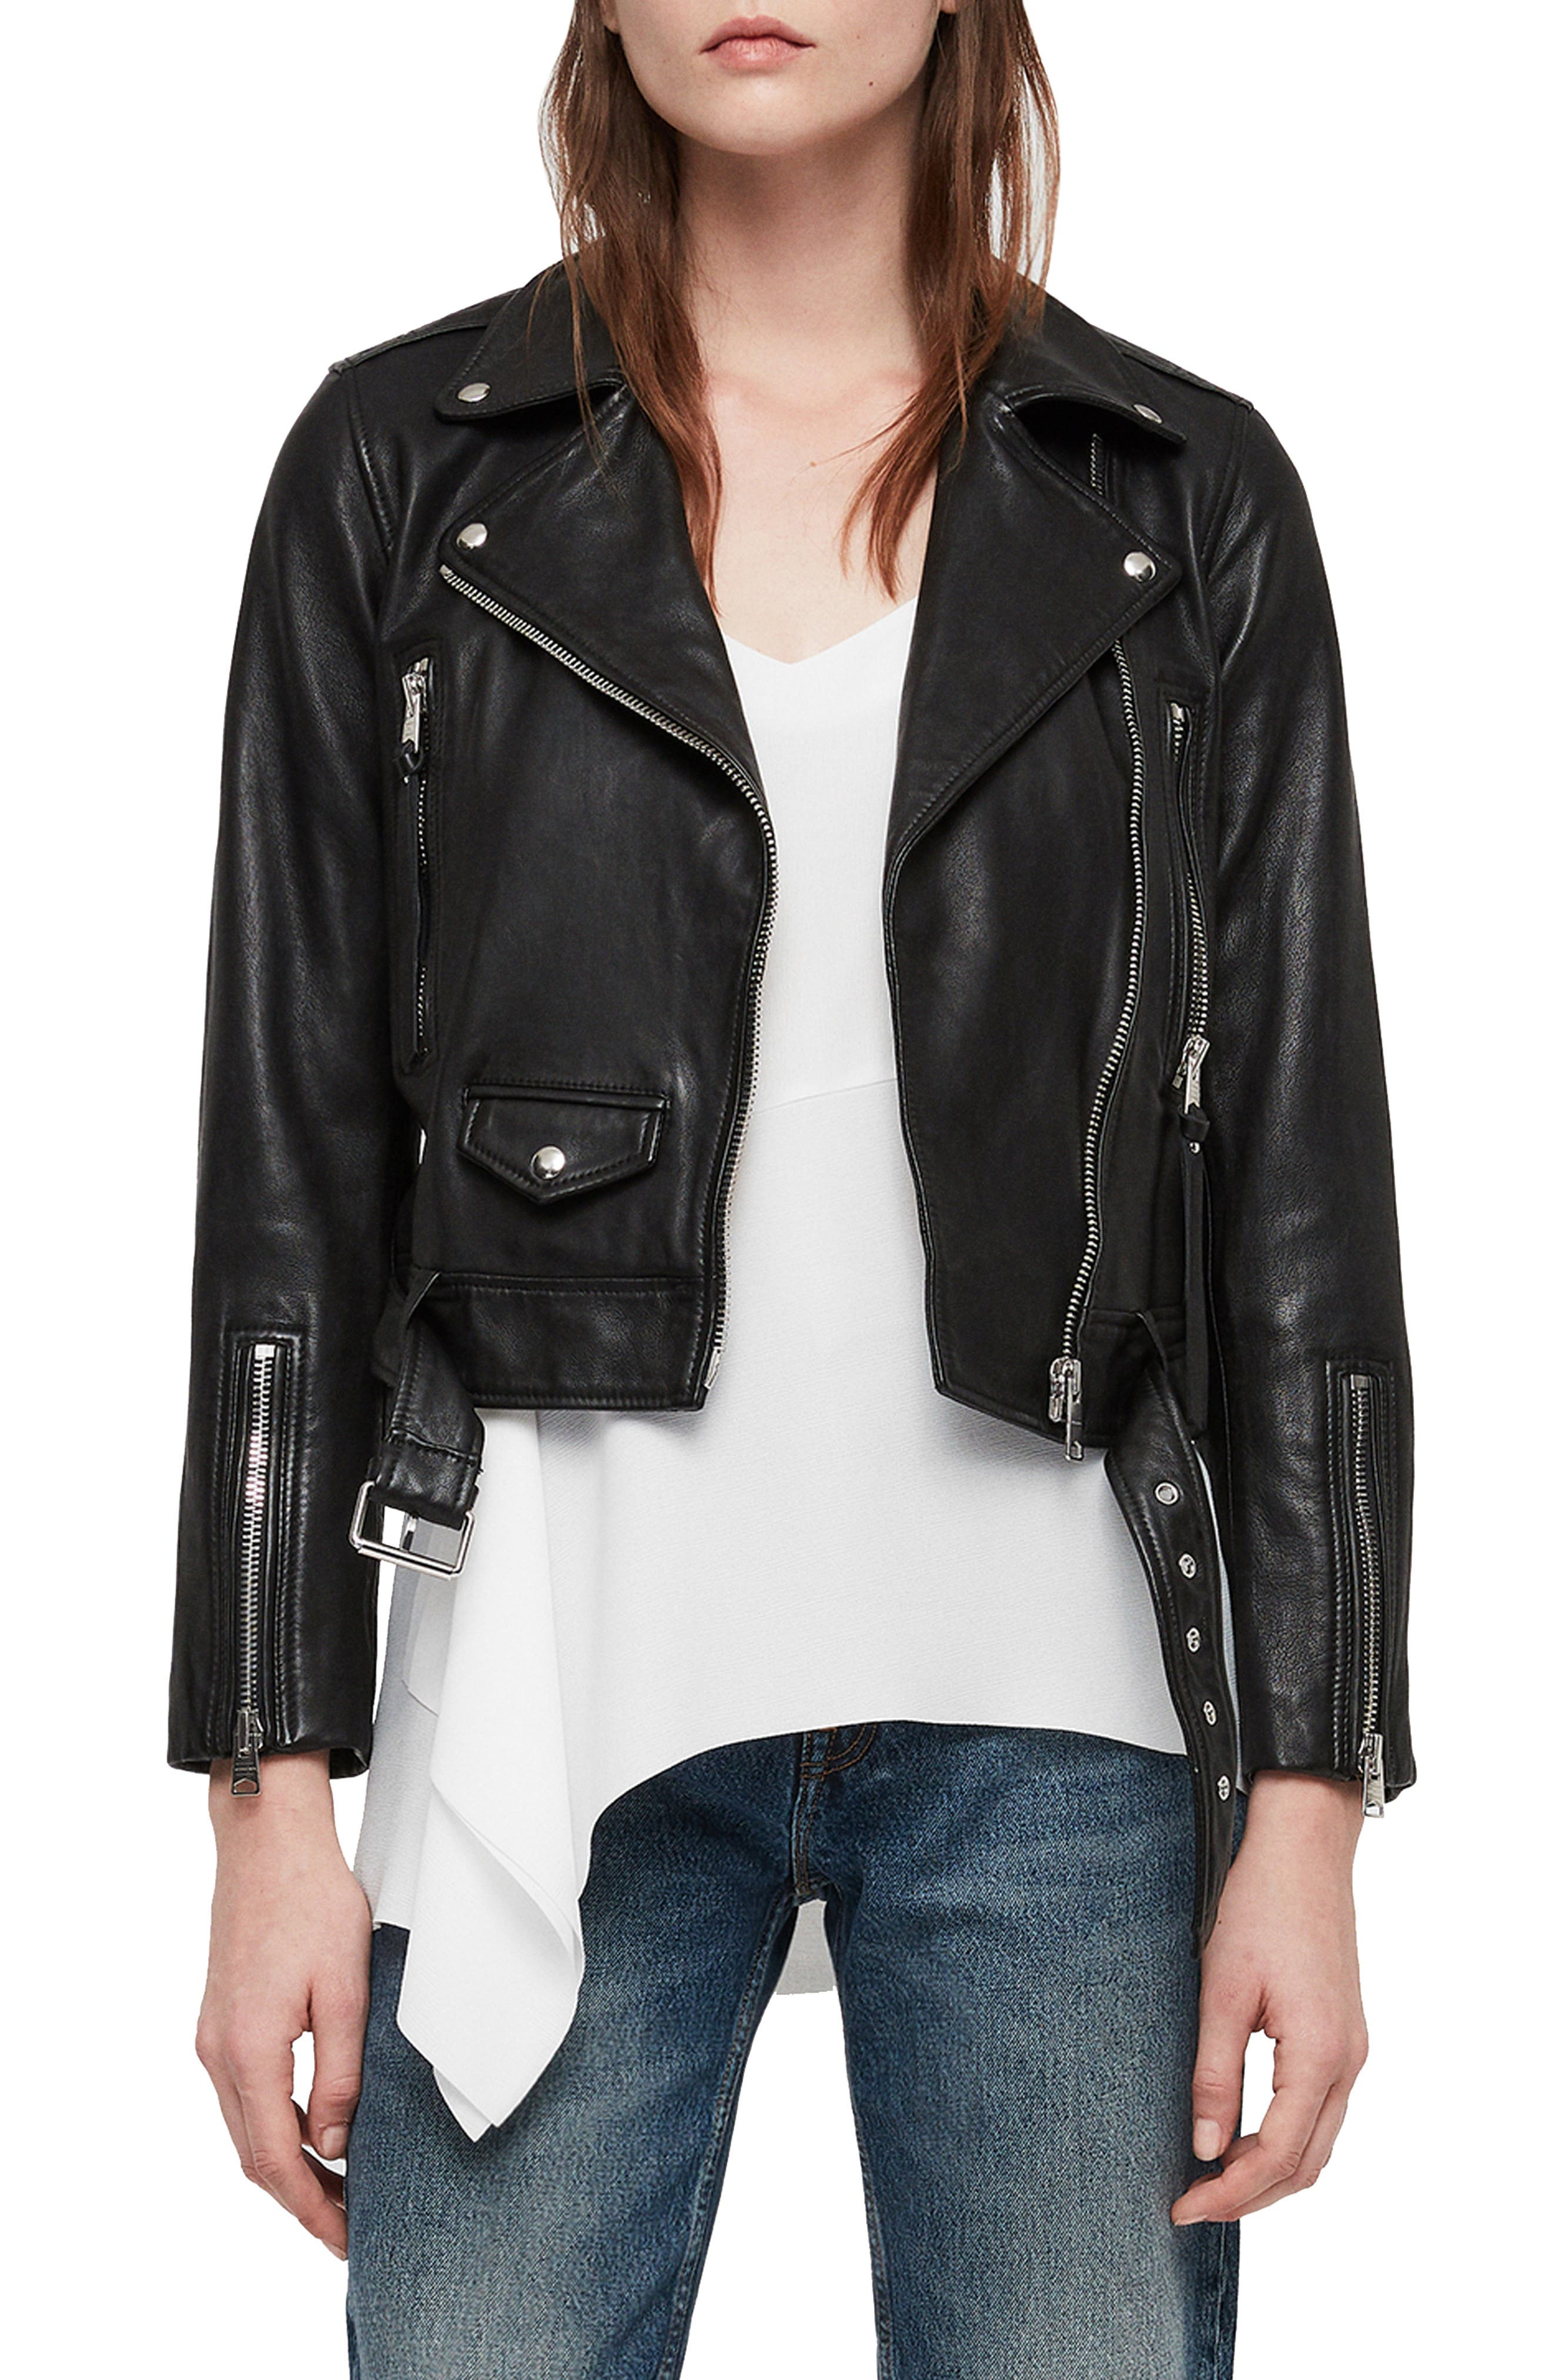 Juno Leather Biker Jacket,                             Main thumbnail 1, color,                             BLACK